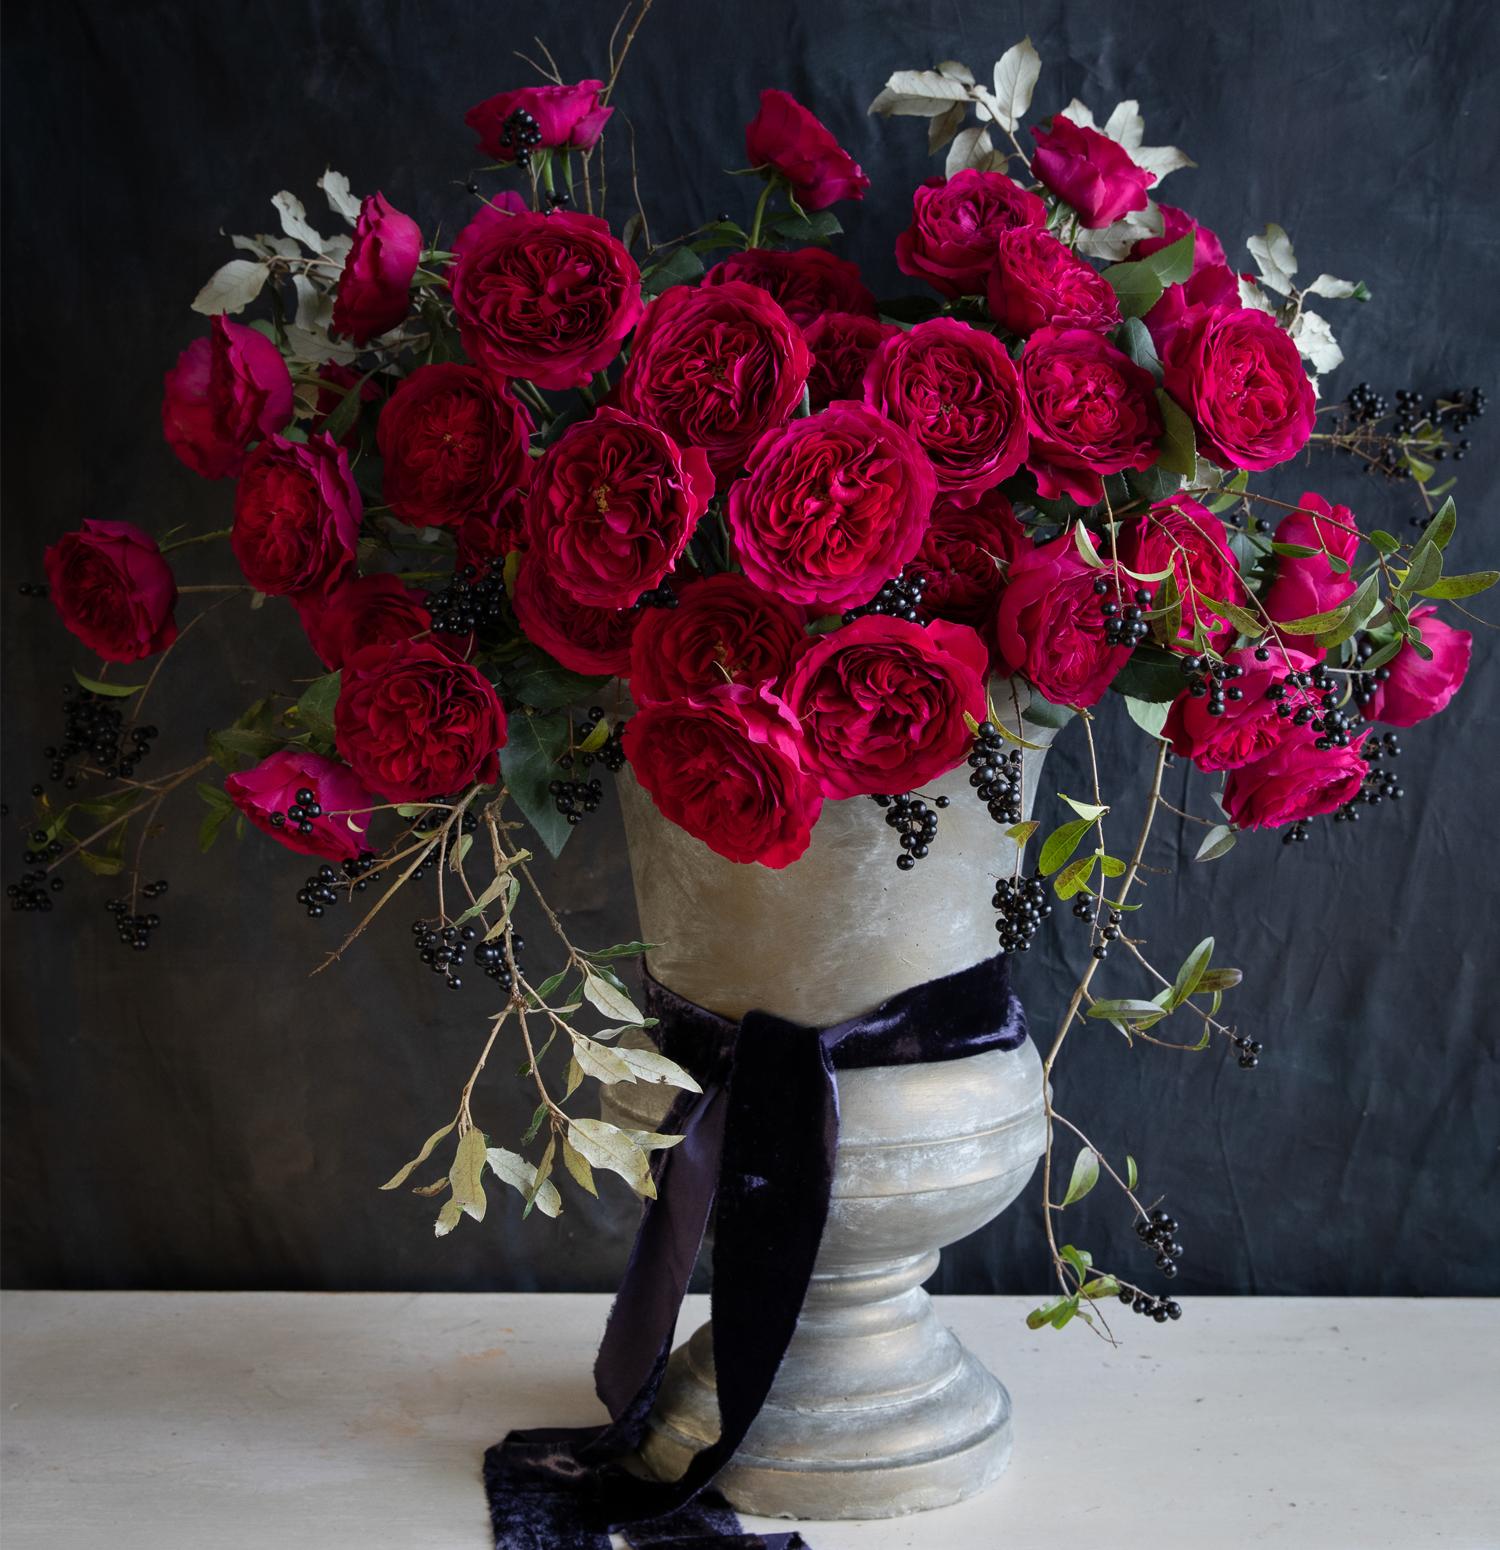 Darcey Red Roses Wedding Urn Design